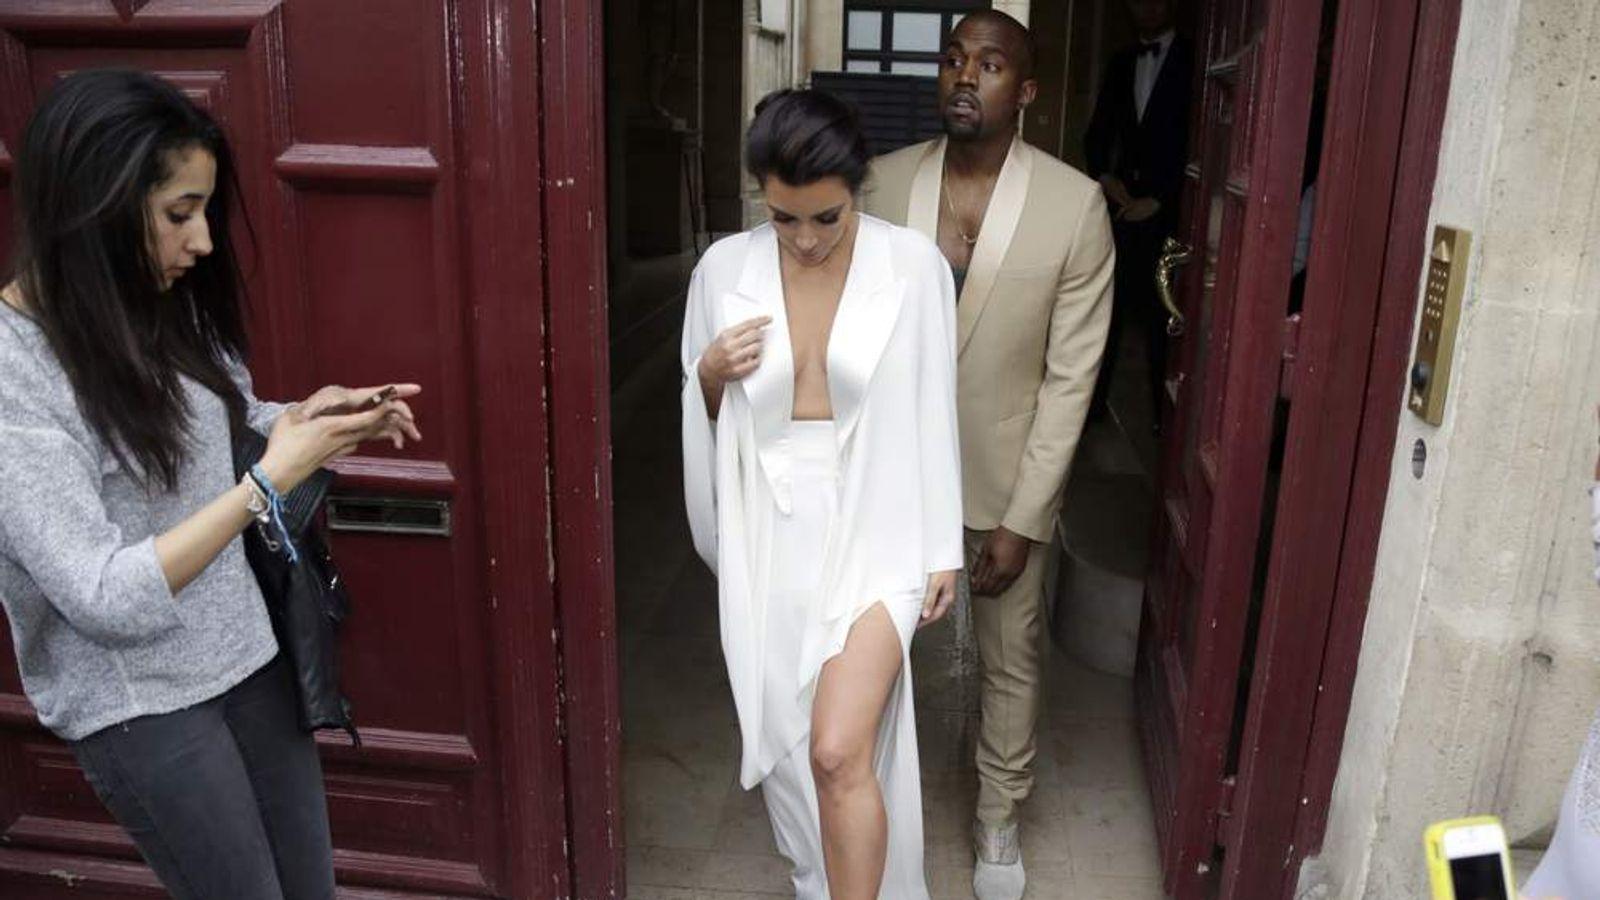 Kinm Kardashian and Kanye West in Paris ahead of their wedding